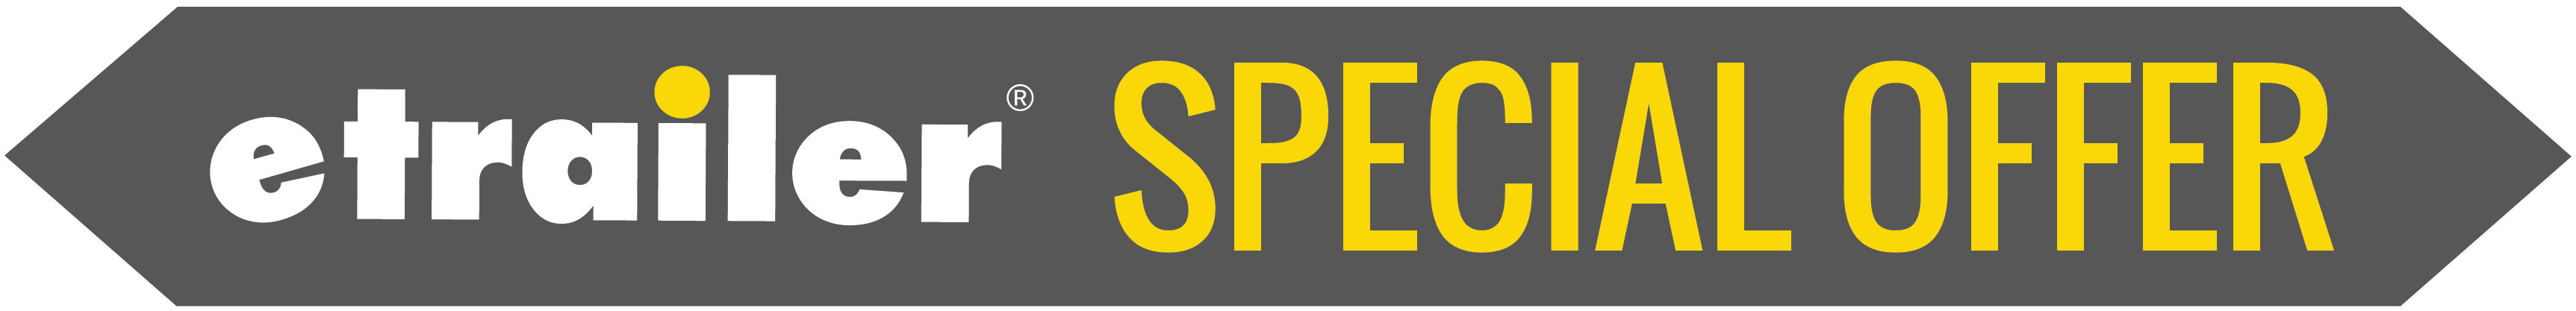 etrailer Special Offer